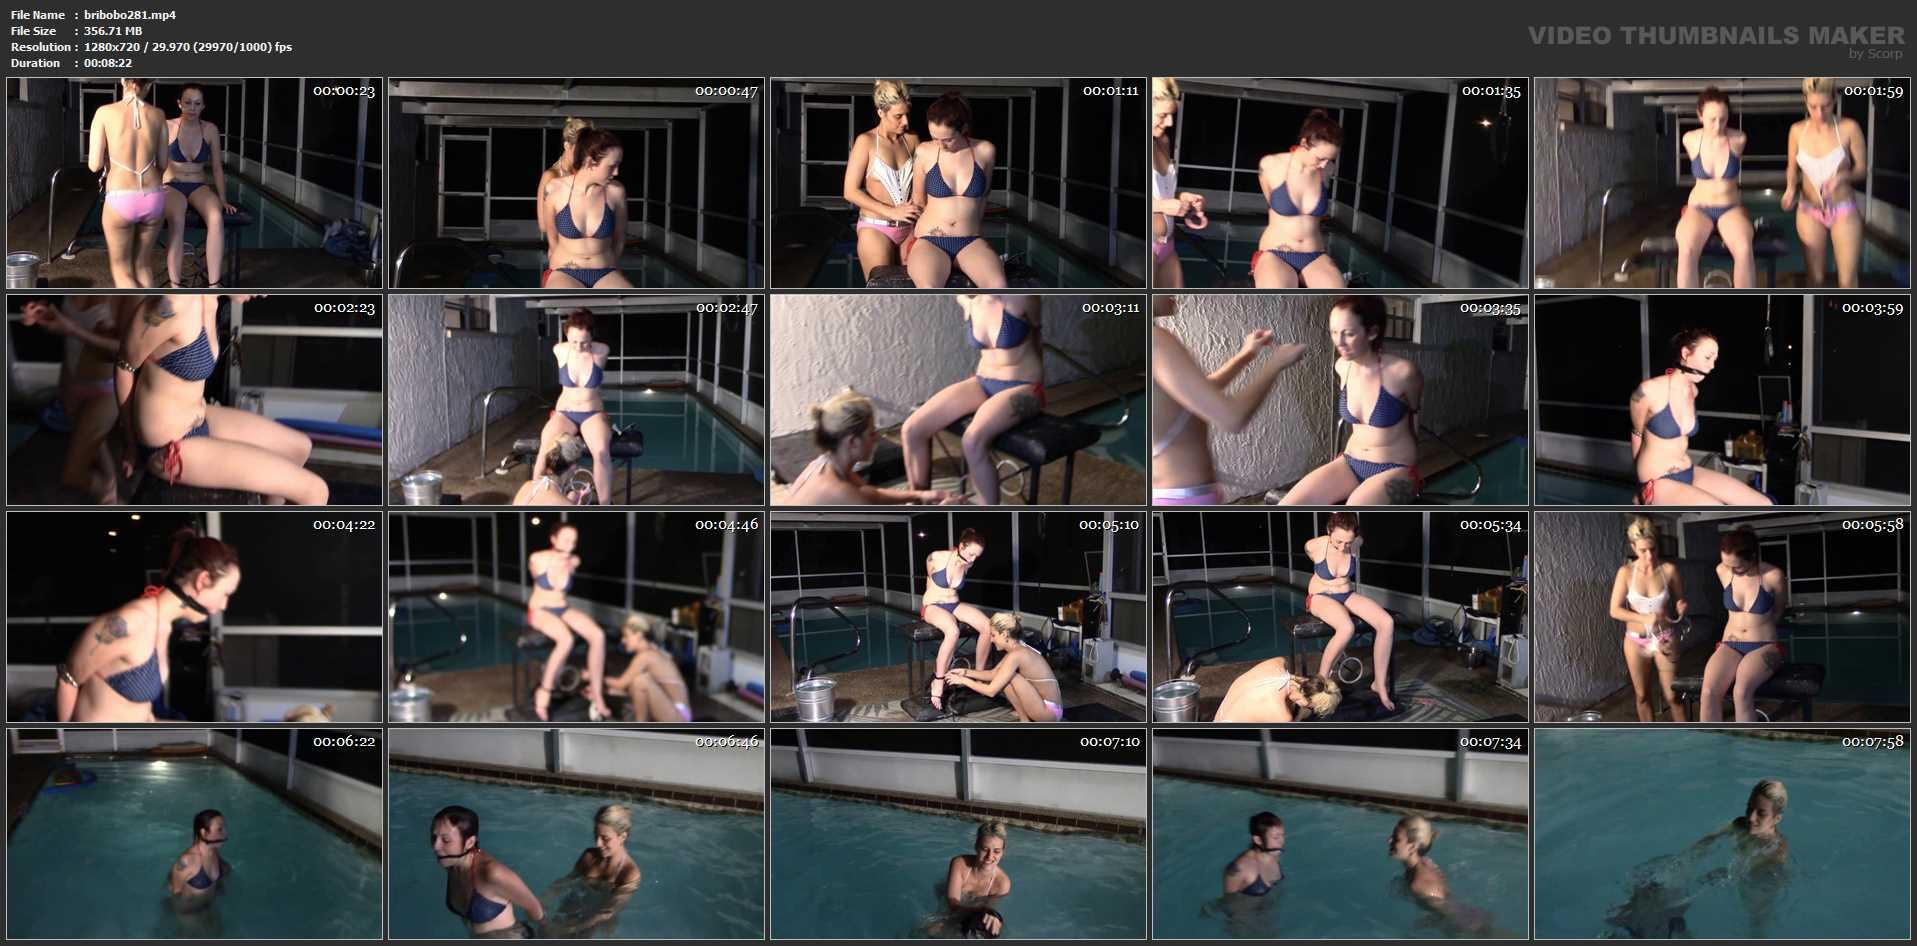 [BRIELLASBONDAGEBOUTIQUE] Sophie Can't Swim In Cuffs. Featuring: Sophie Sweets, Briella Jaden [HD][720p][MP4]